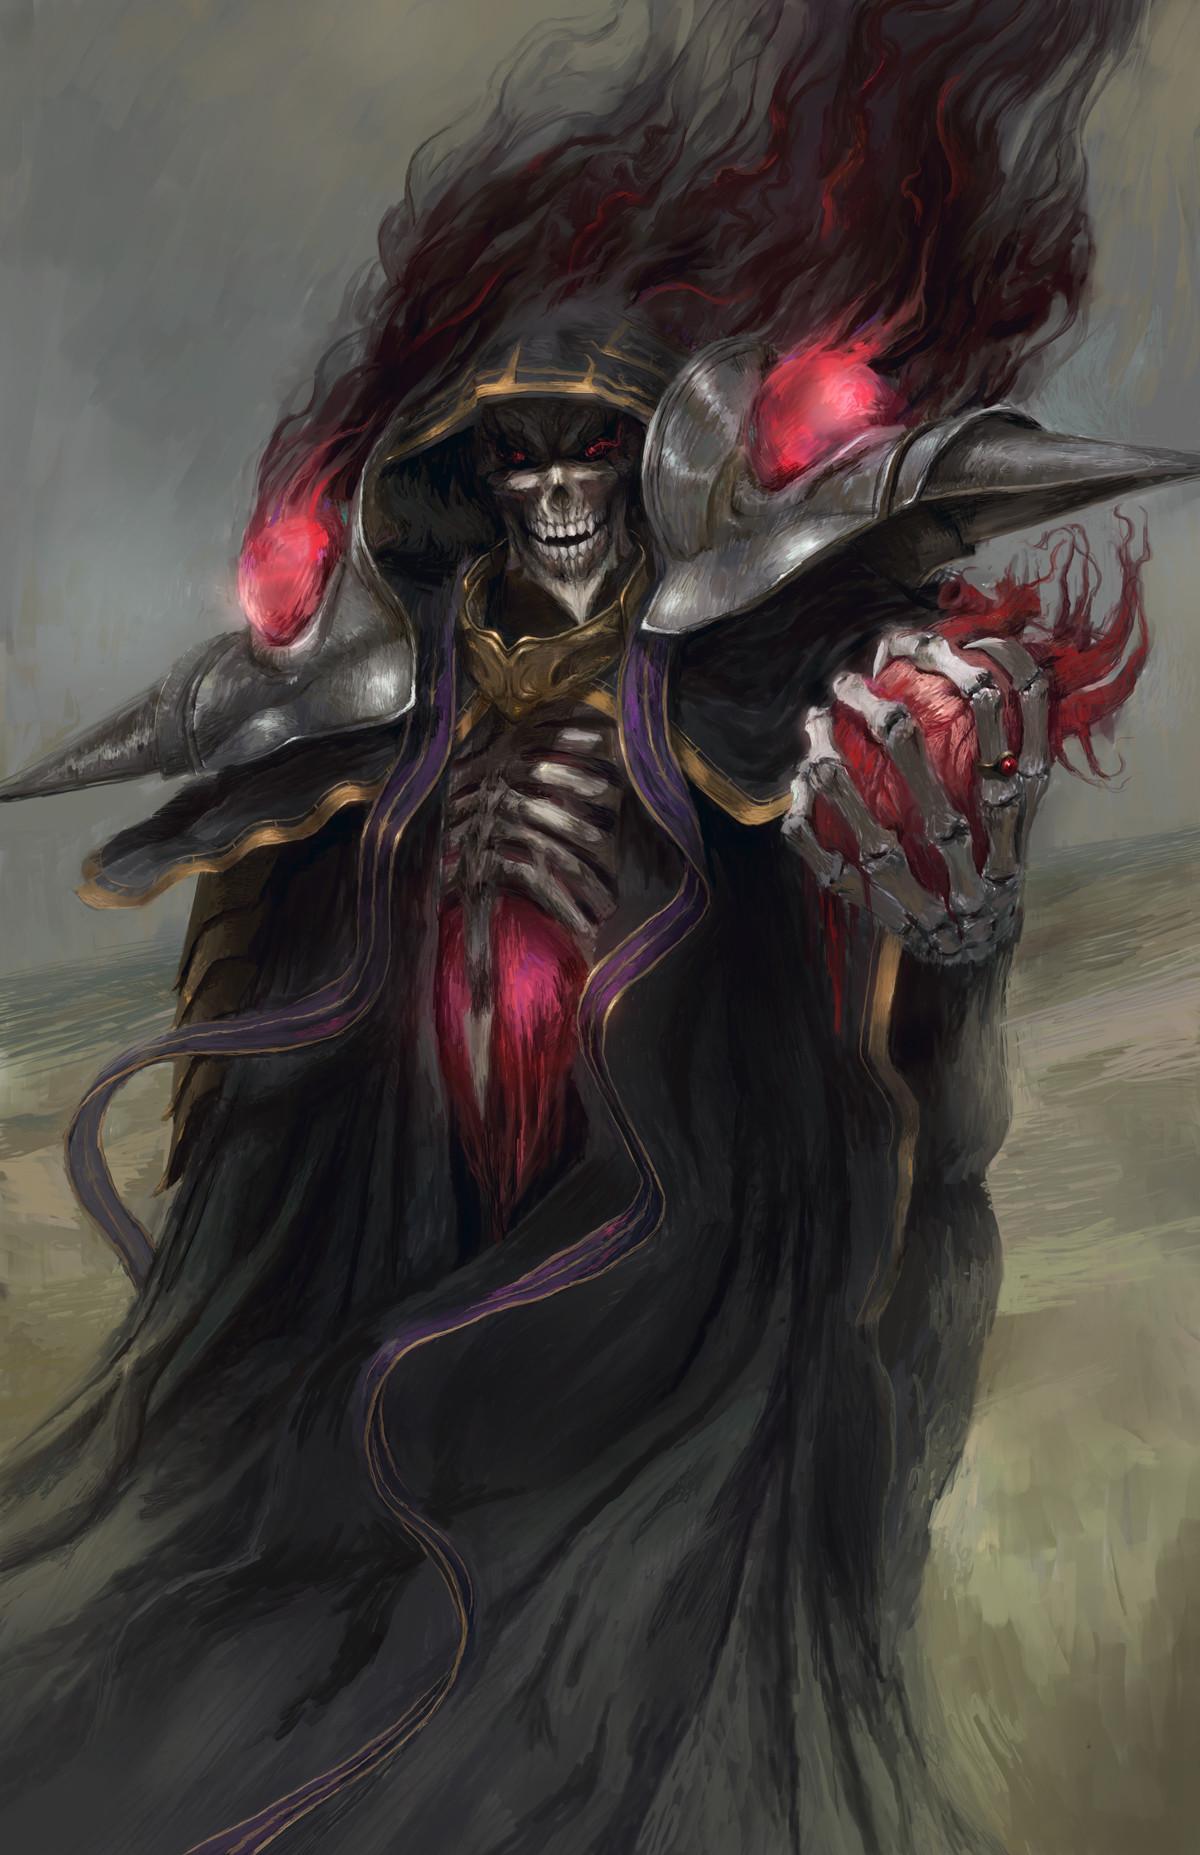 Ari ibarra overlord